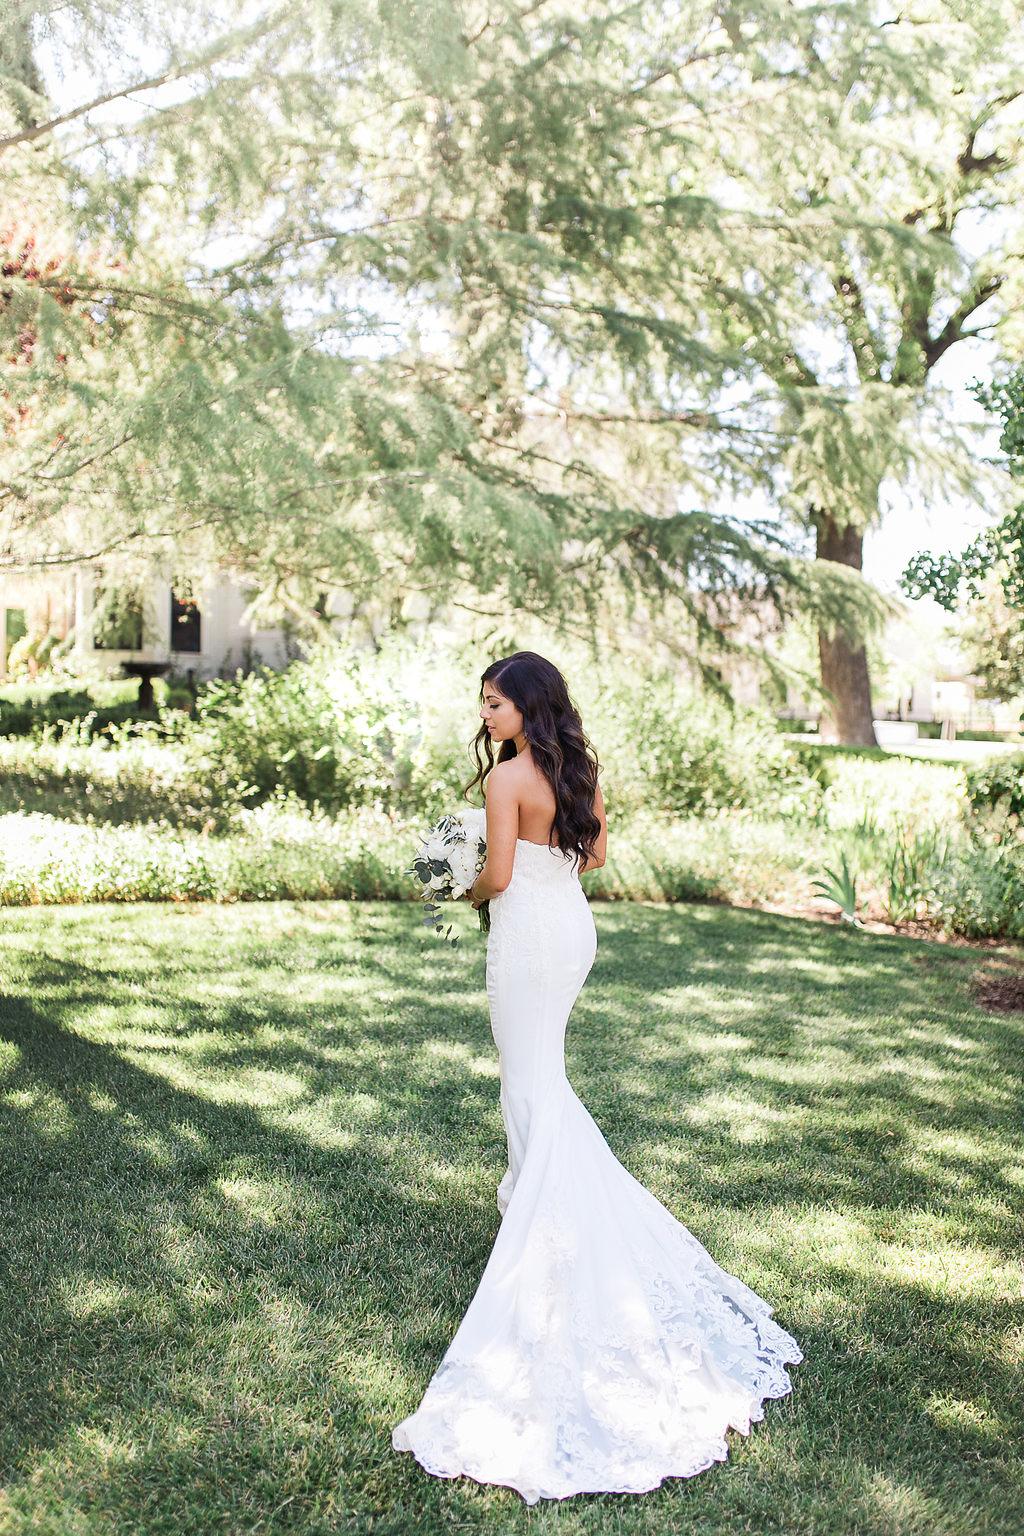 Park Winters Summer Wedding | Bridal Portrait